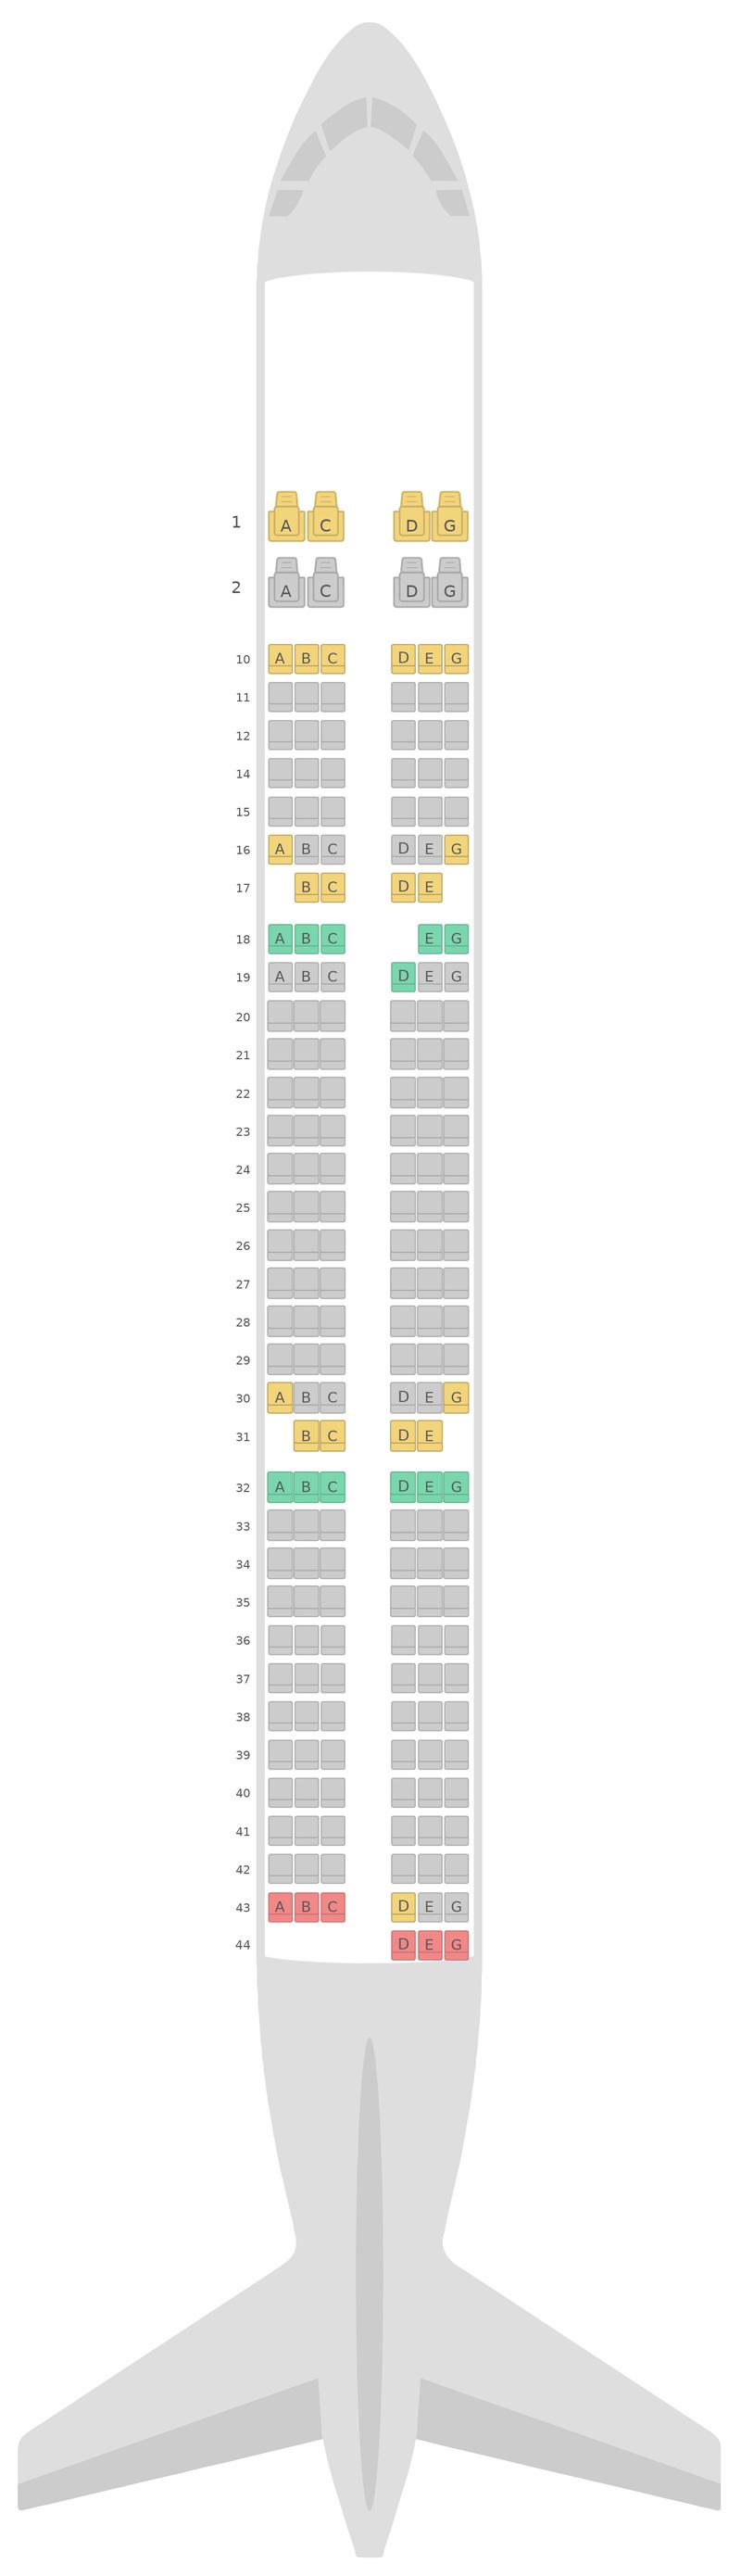 Sitzplan Airbus A321 v3 Vietnam Airlines